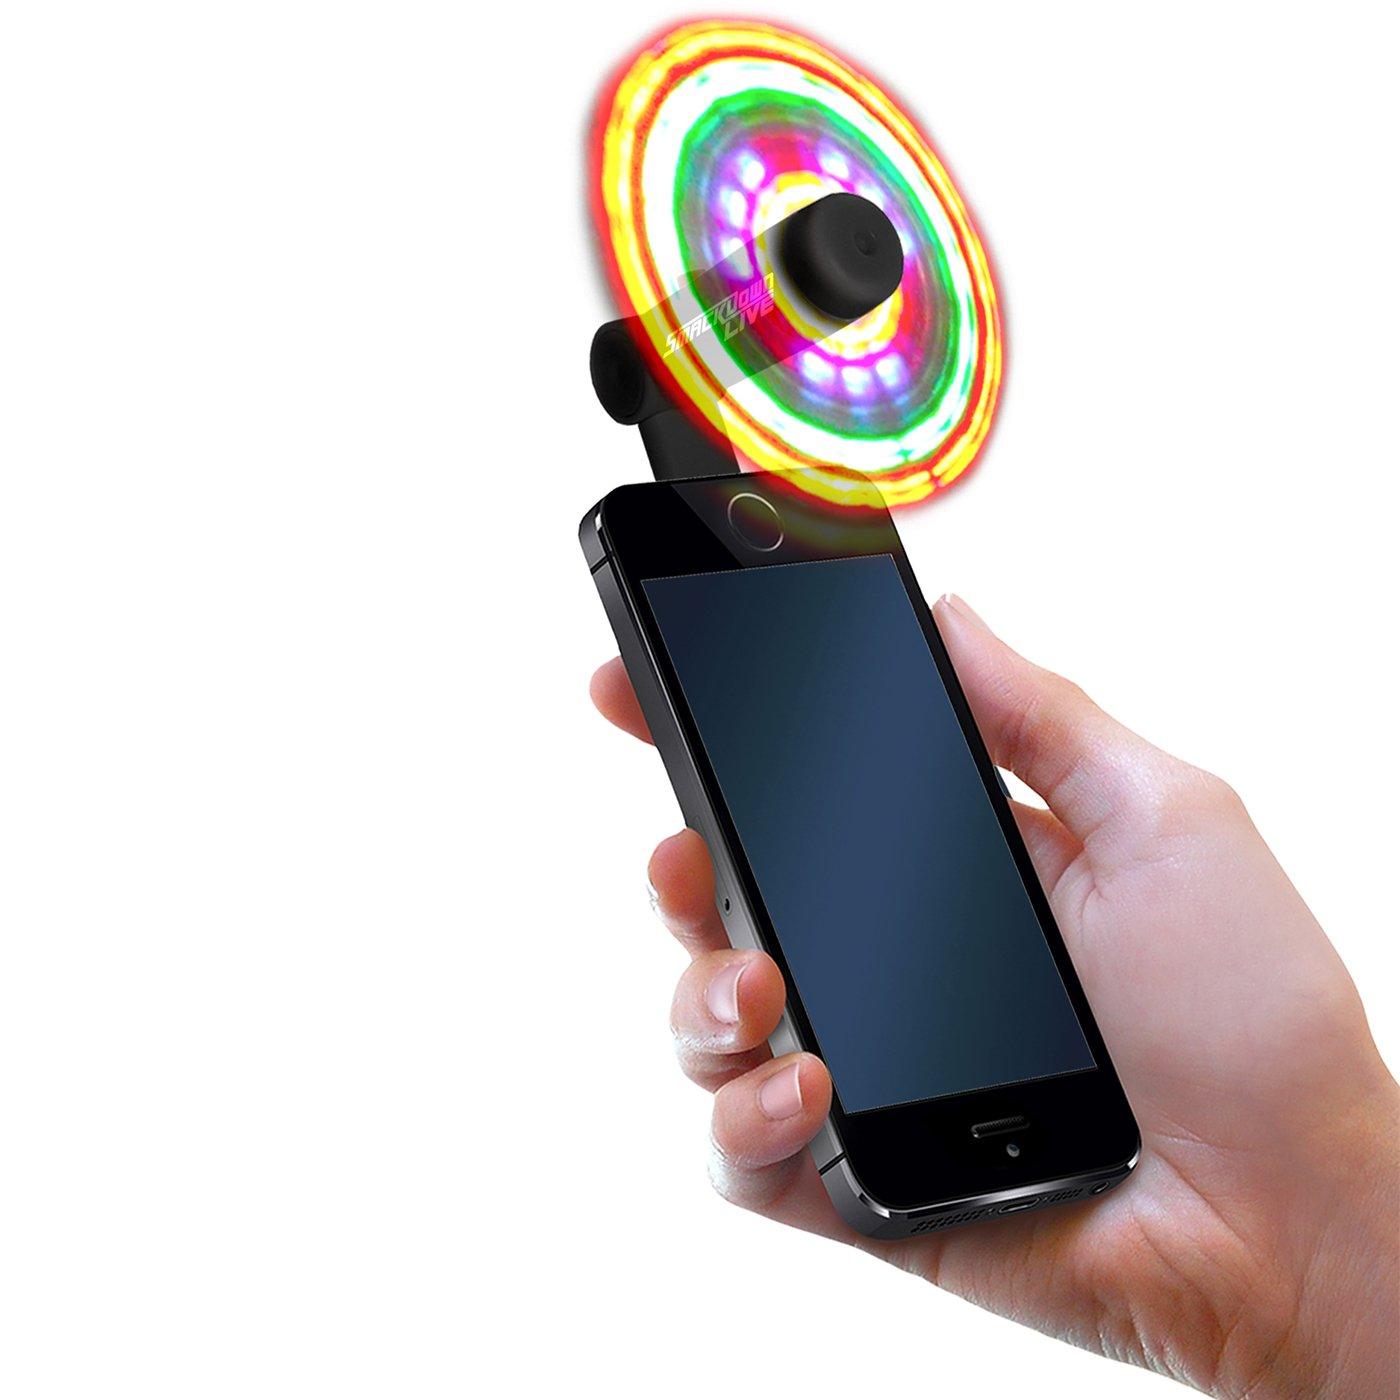 FlashFan Light Up Fans for Cellphone Flash Fan LED Phone Fan Android MICRO USB Only Model Burning Man EDC Mardi Gras Festival or Halloween Black